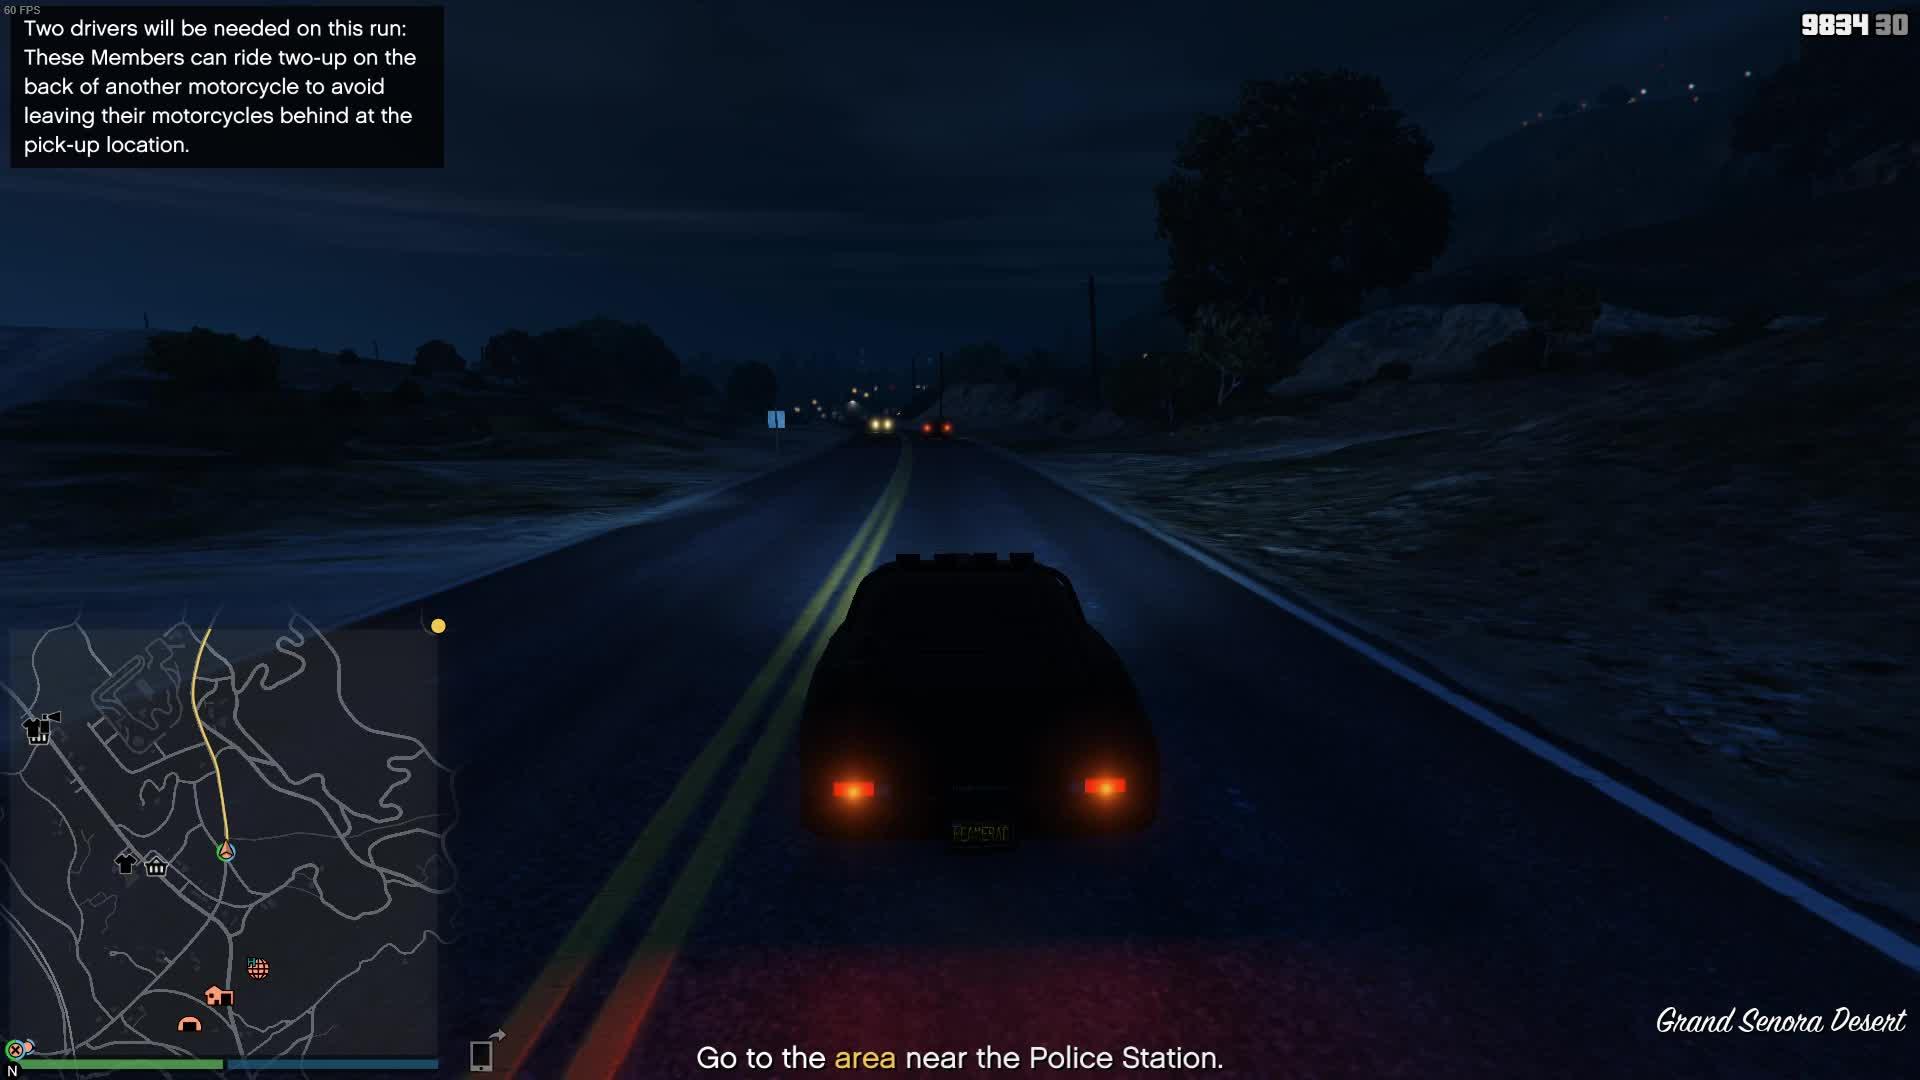 grandtheftautov, vlc-record-2019-02-06-17h43m32s-Grand Theft Auto V 2019.02.05 - 20.21.10.04.DVR.mp4- GIFs